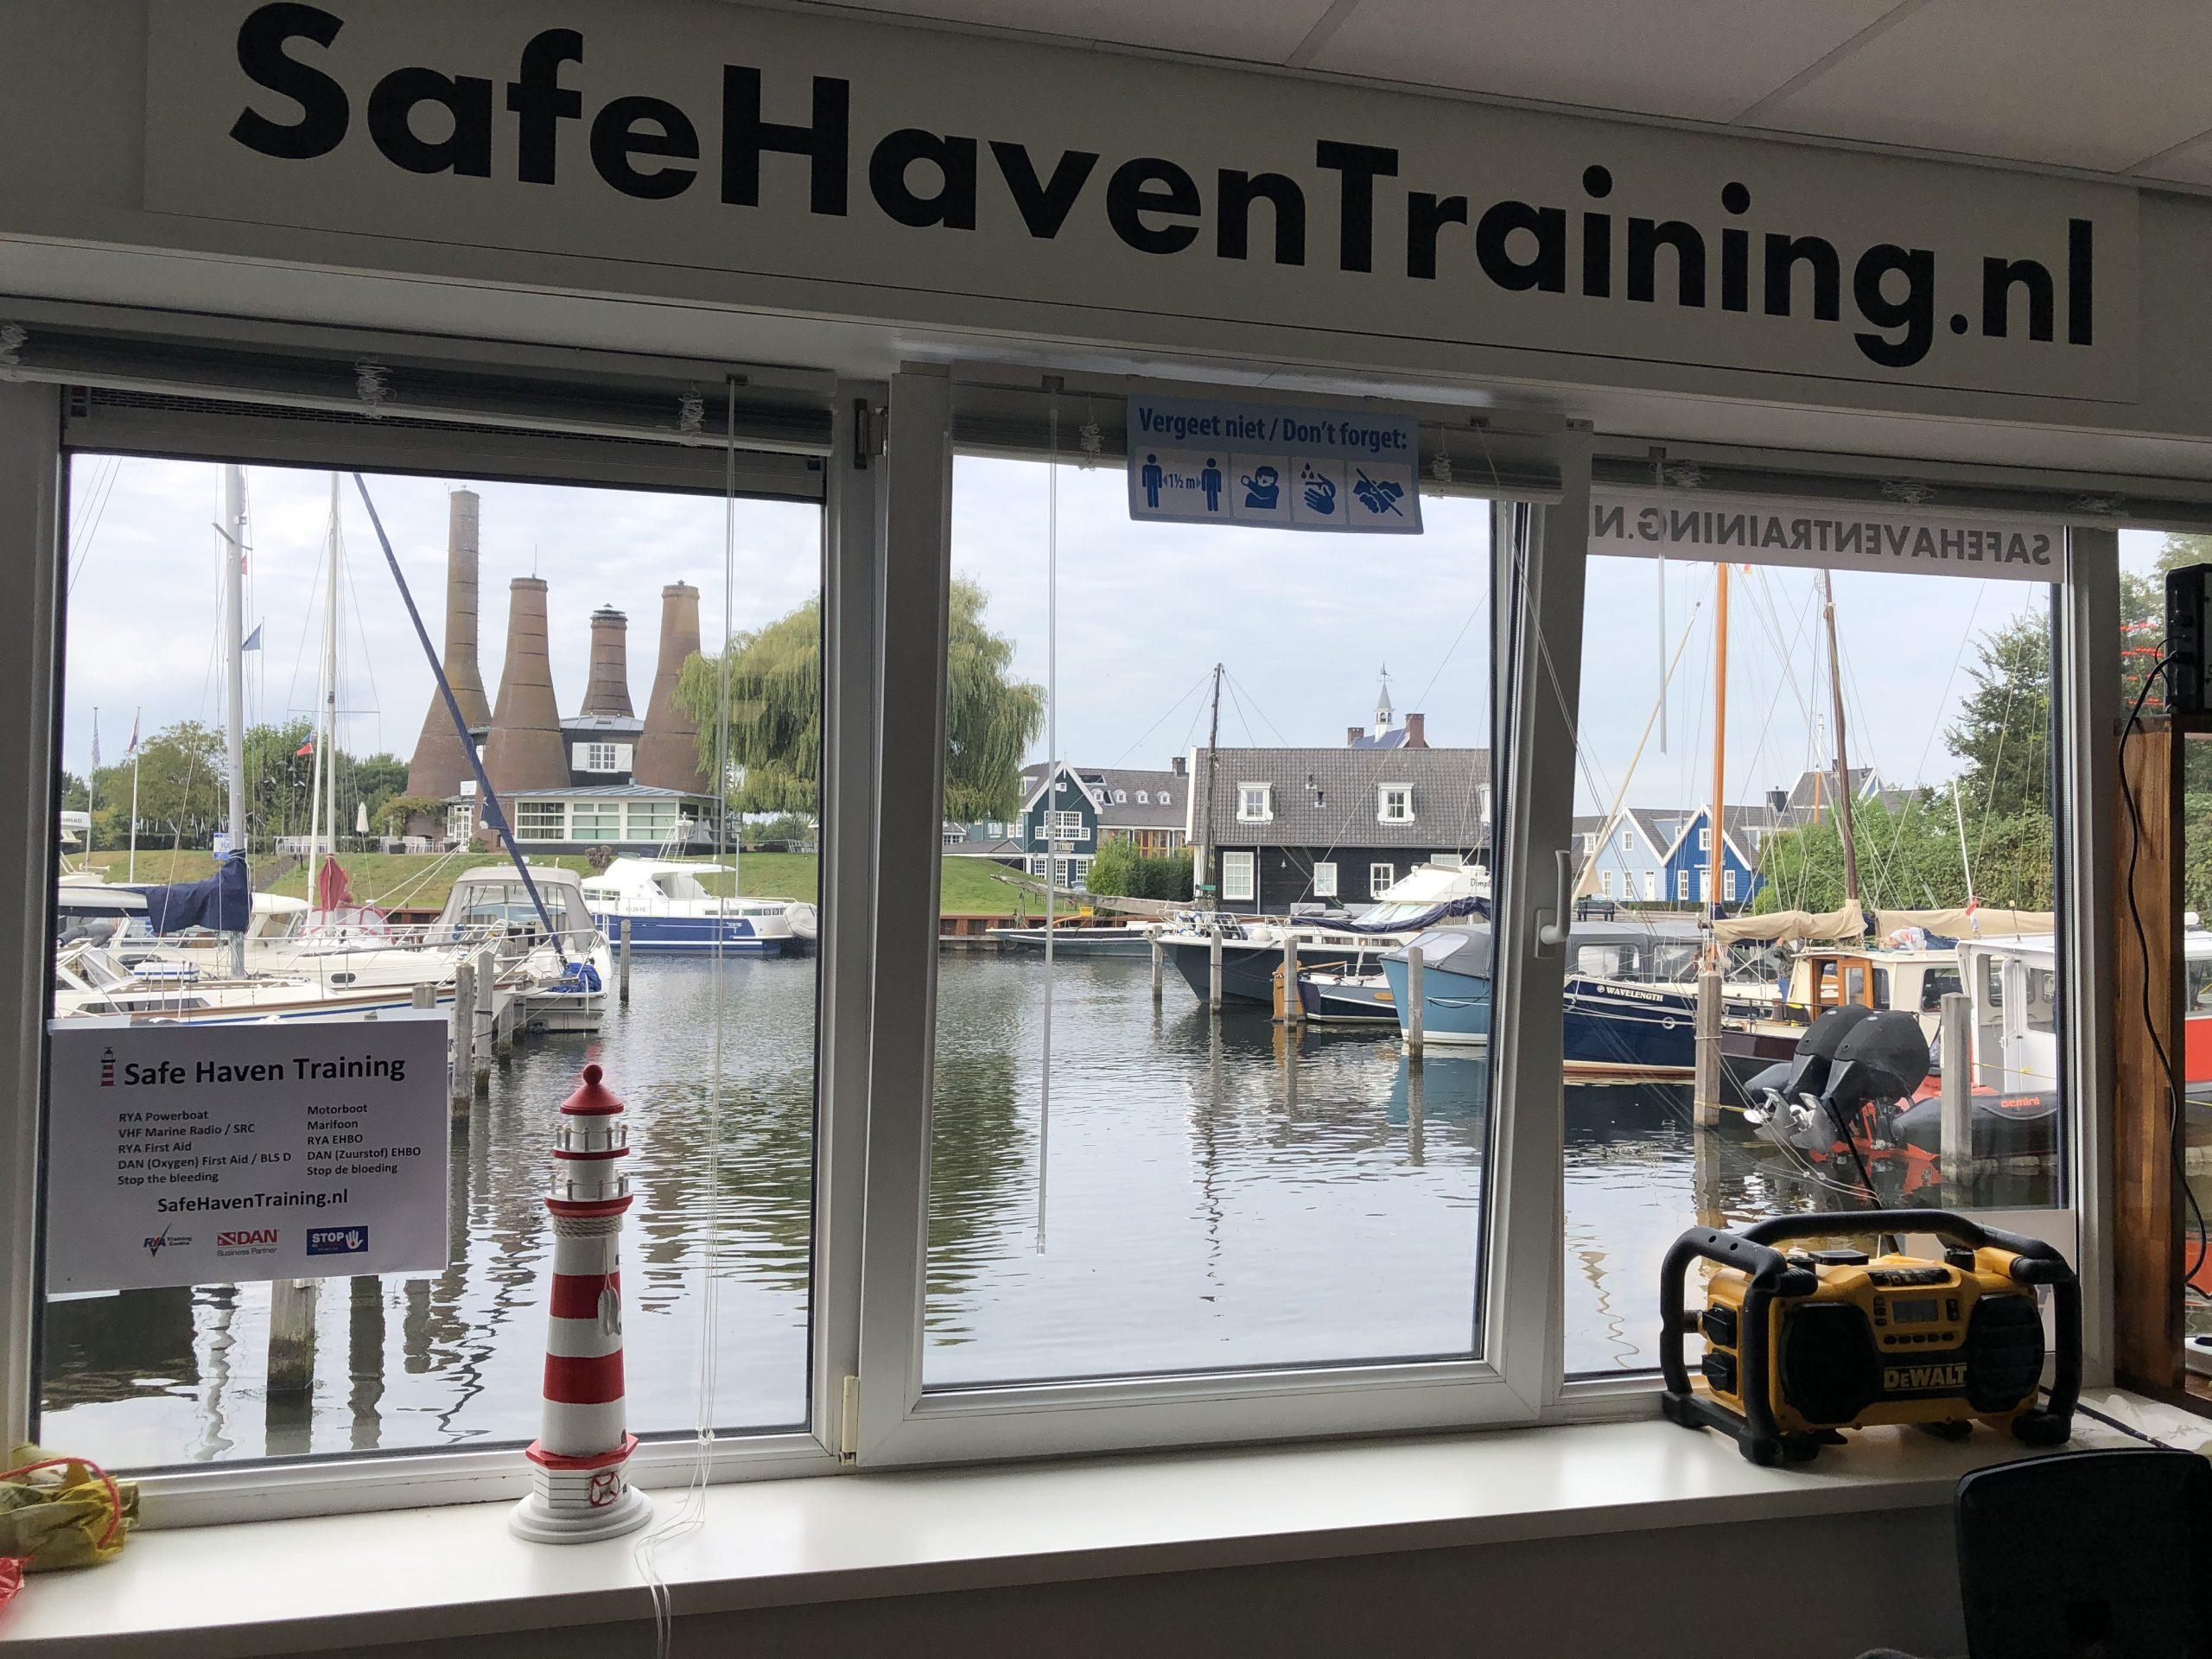 Safe Haven Training at Huizen